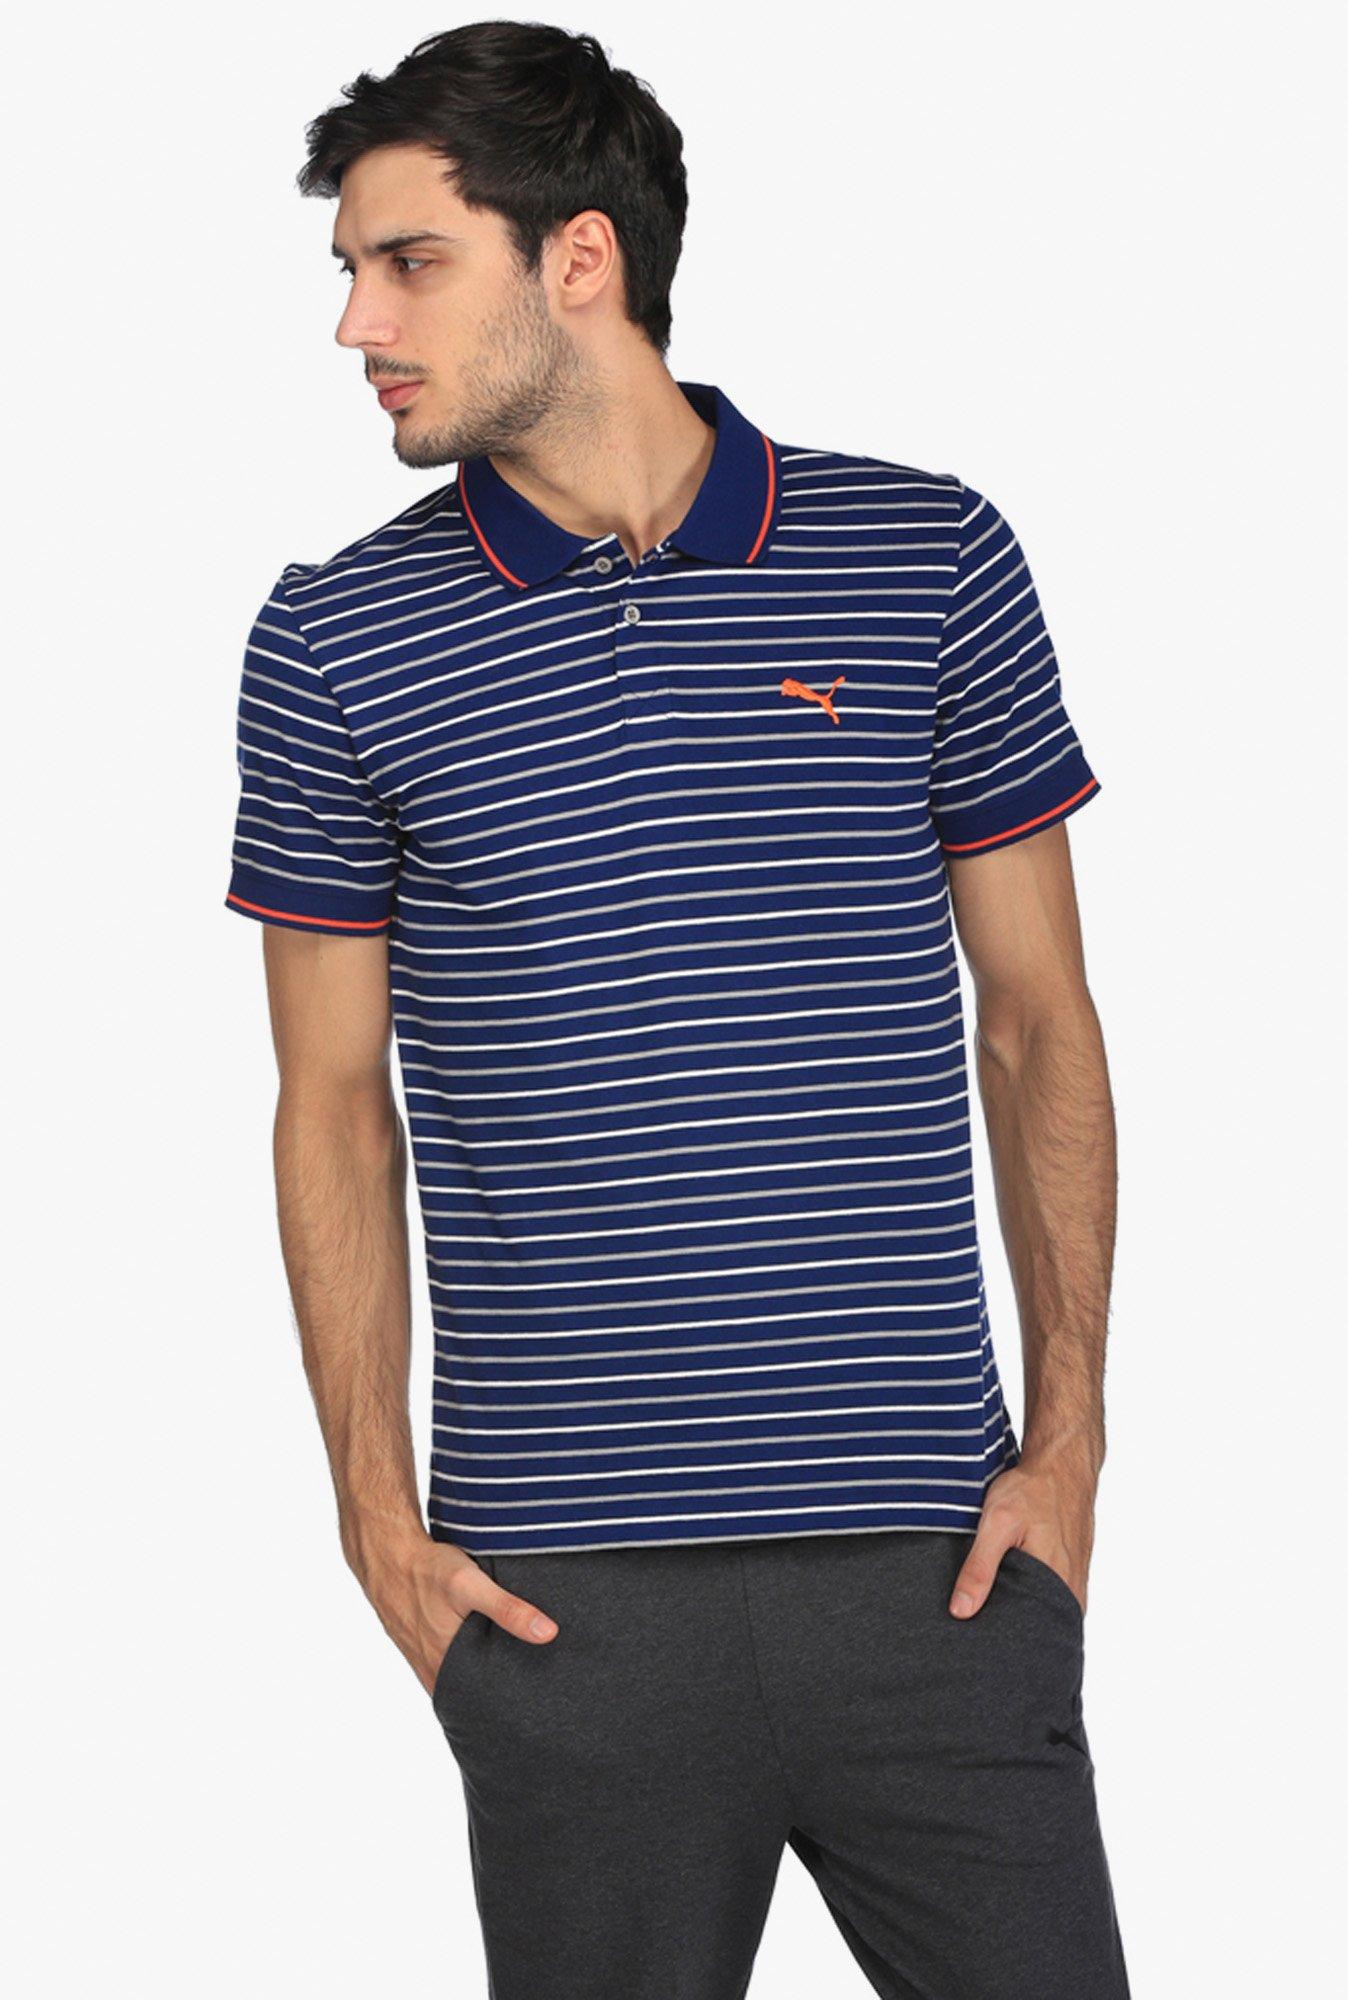 59c4053e Buy Puma Navy Slim Fit Striped Polo T-Shirt for Men Online @ Tata ...